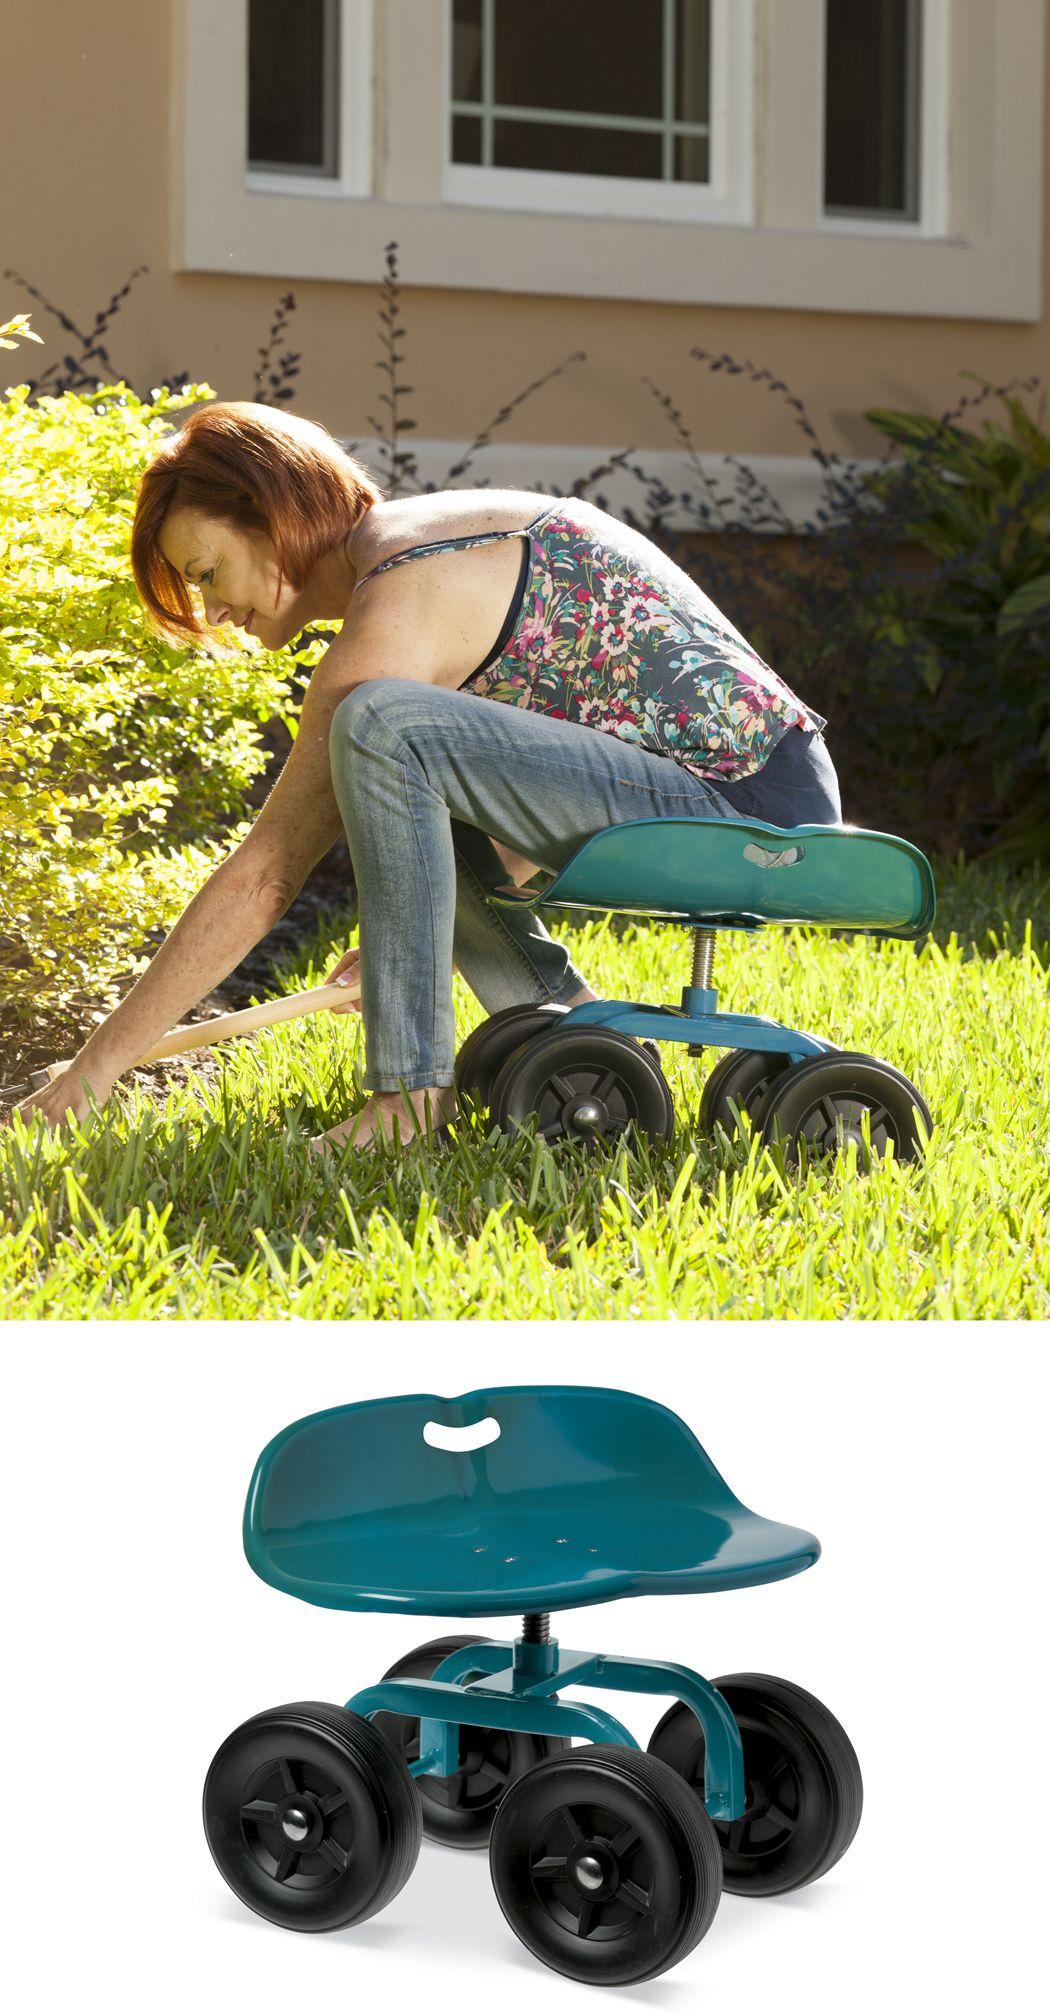 Gardening Seat Gardening Chair Low Rider Swivel Scoot With